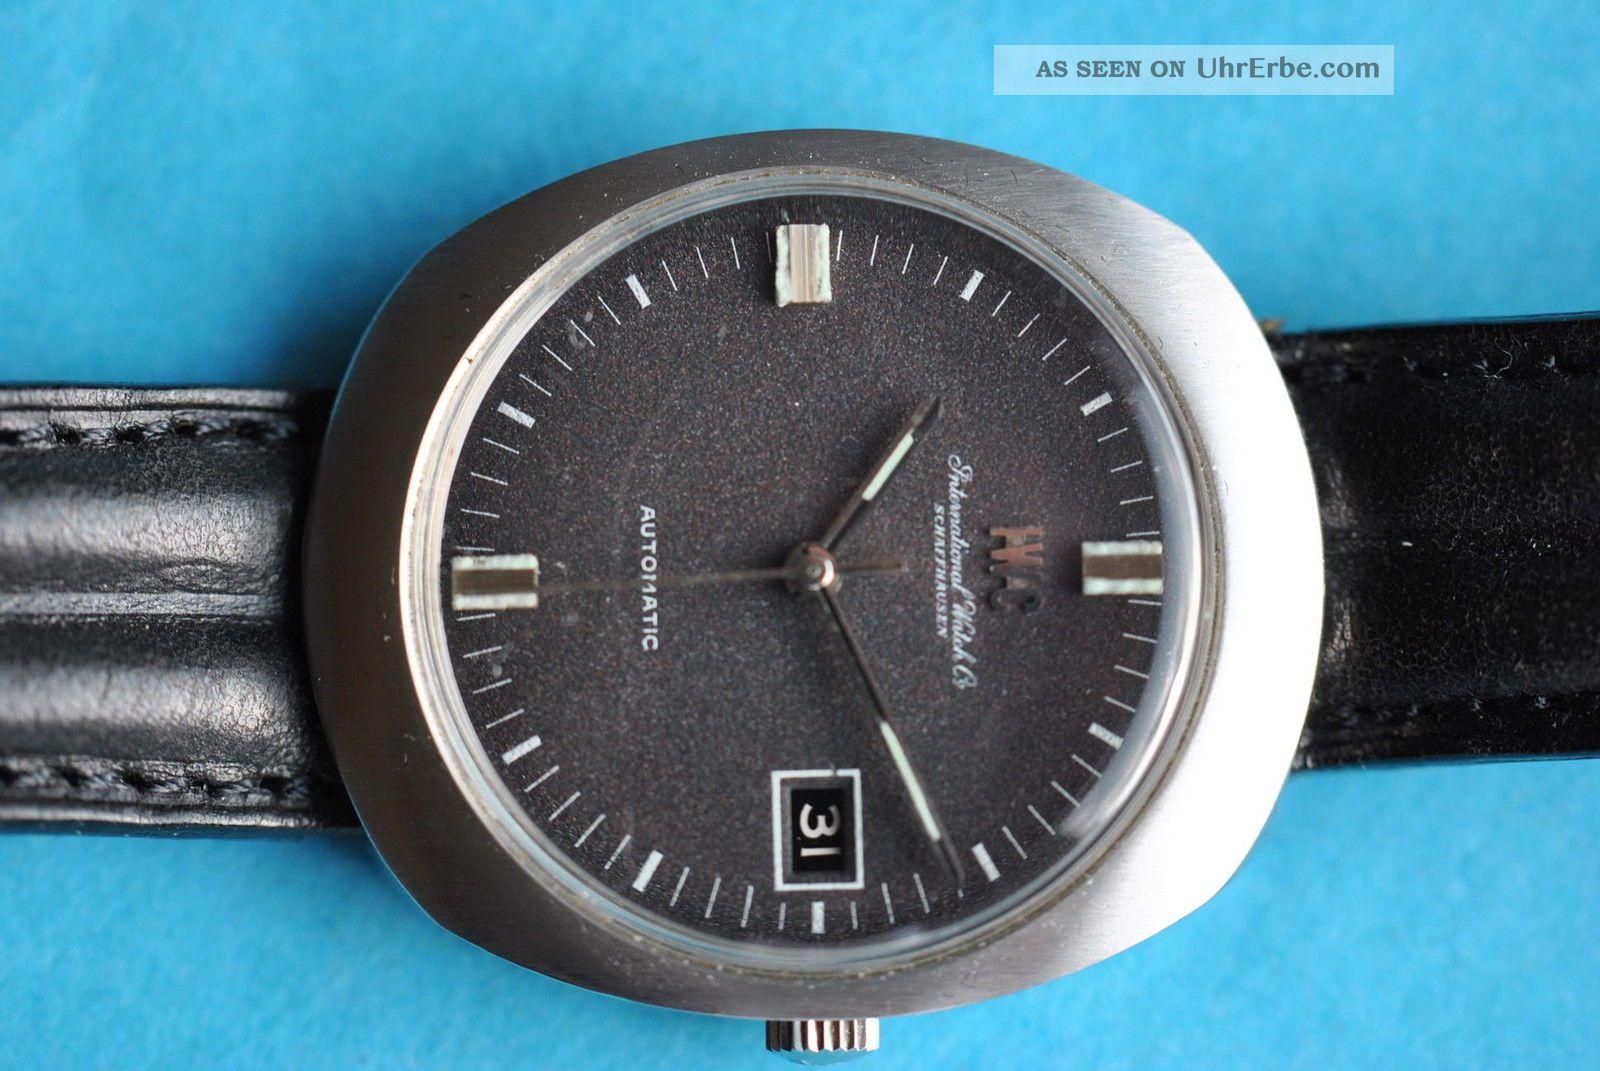 Iwc Automatik Herrenuhr Edelstahl,  Datum Aus Den Siebzigern Armbanduhren Bild